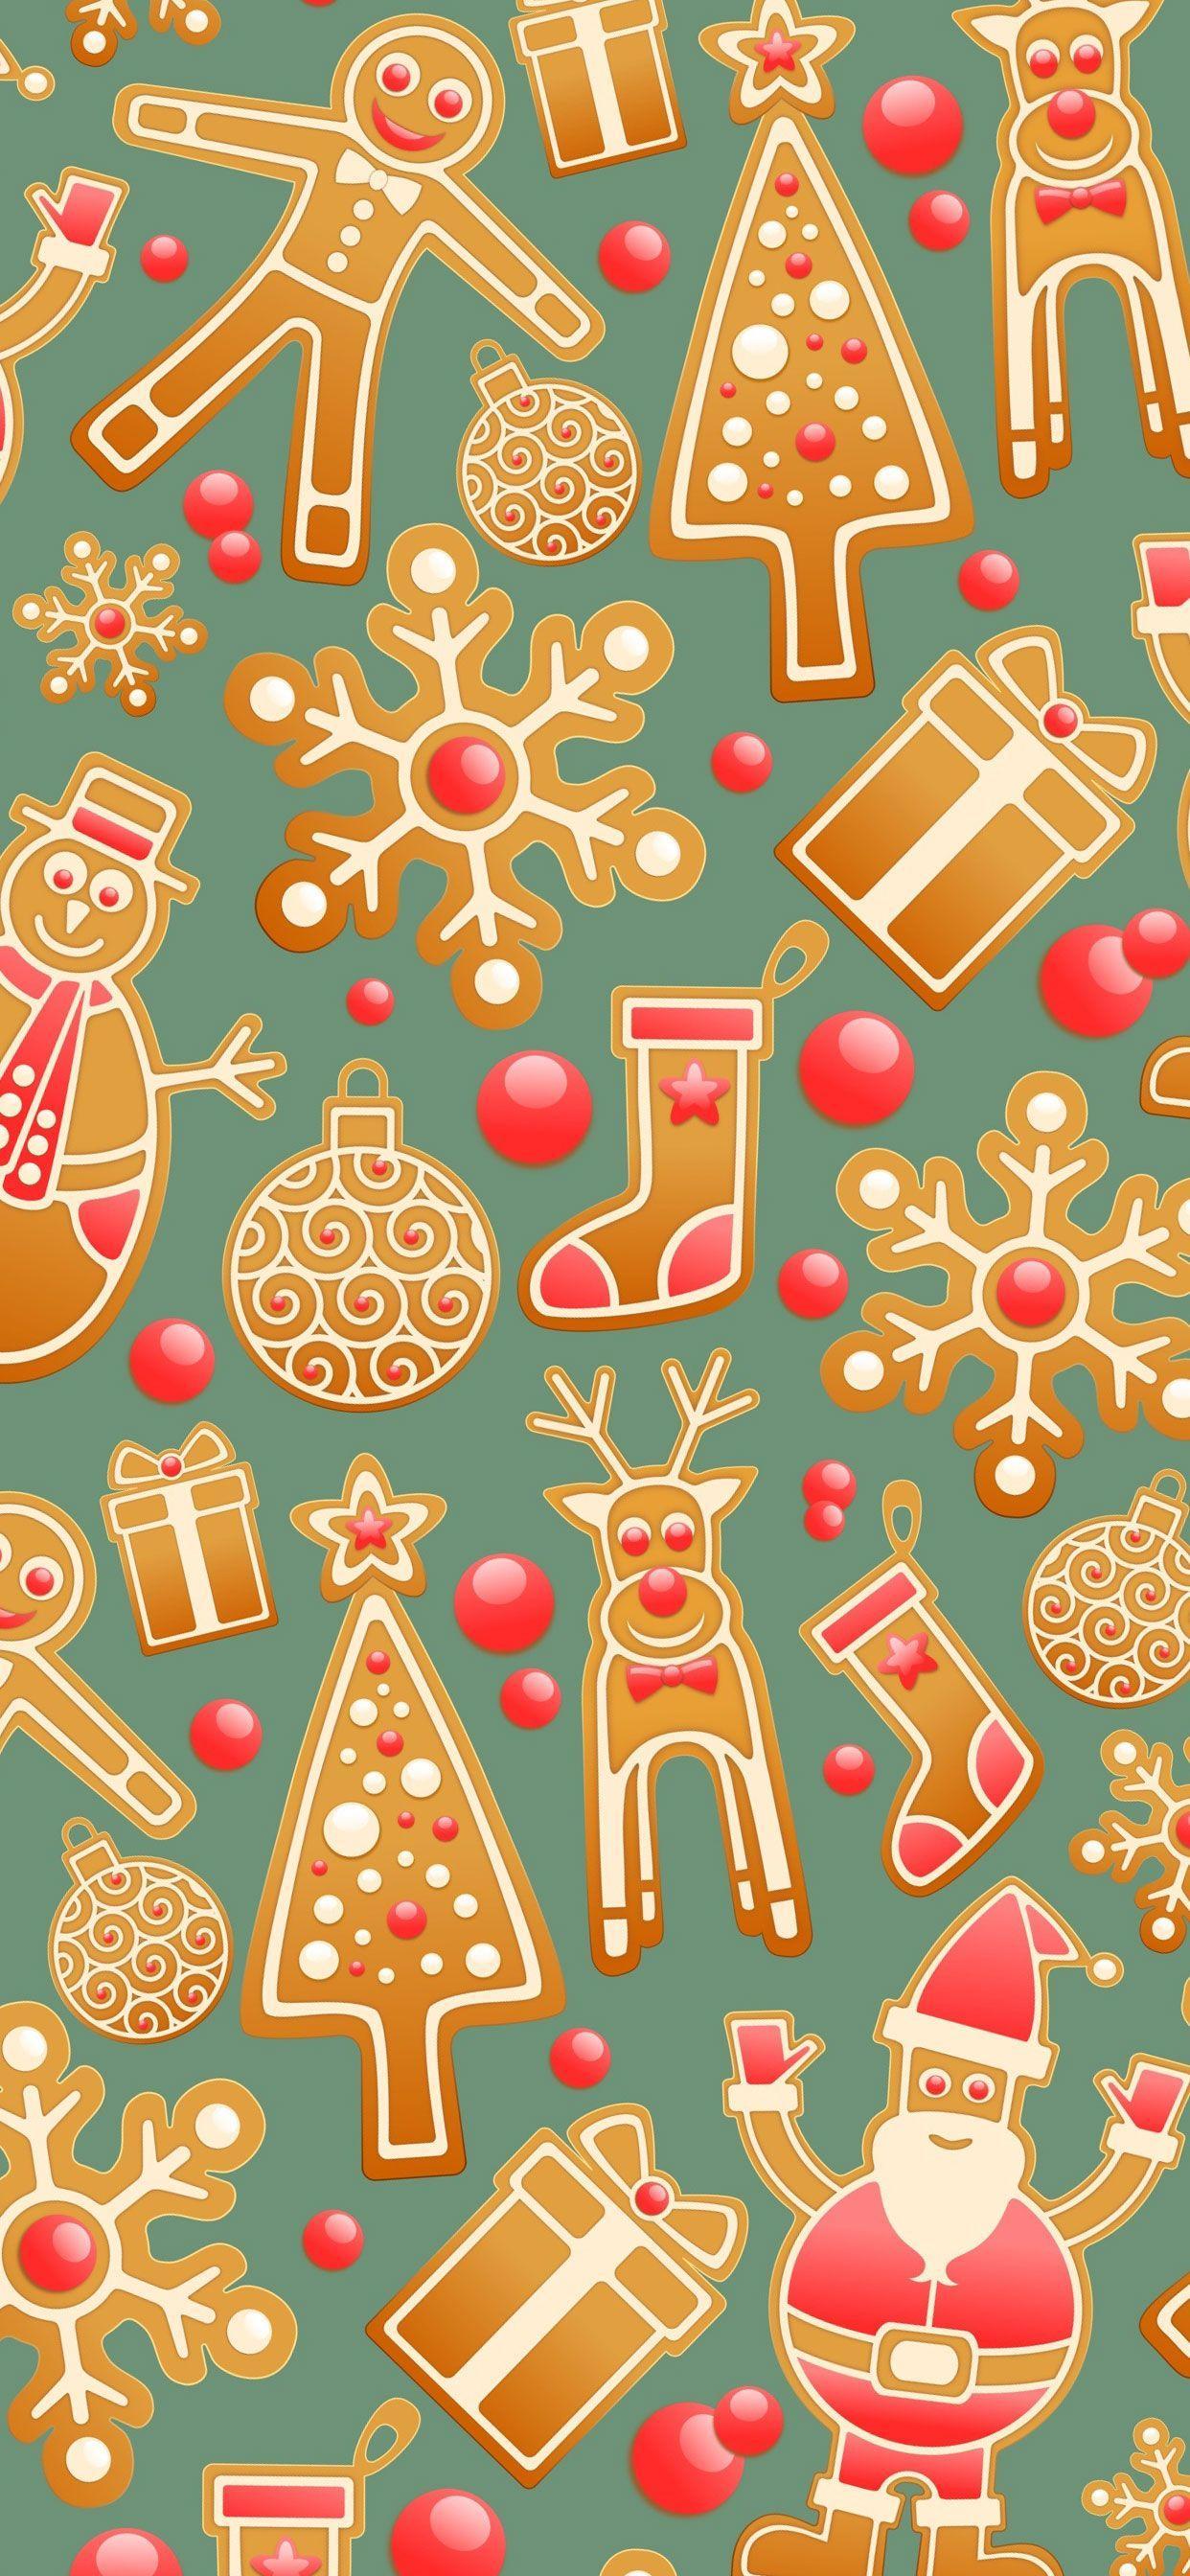 Gingerbread Phone Wallpapers   Wallpaper Cave